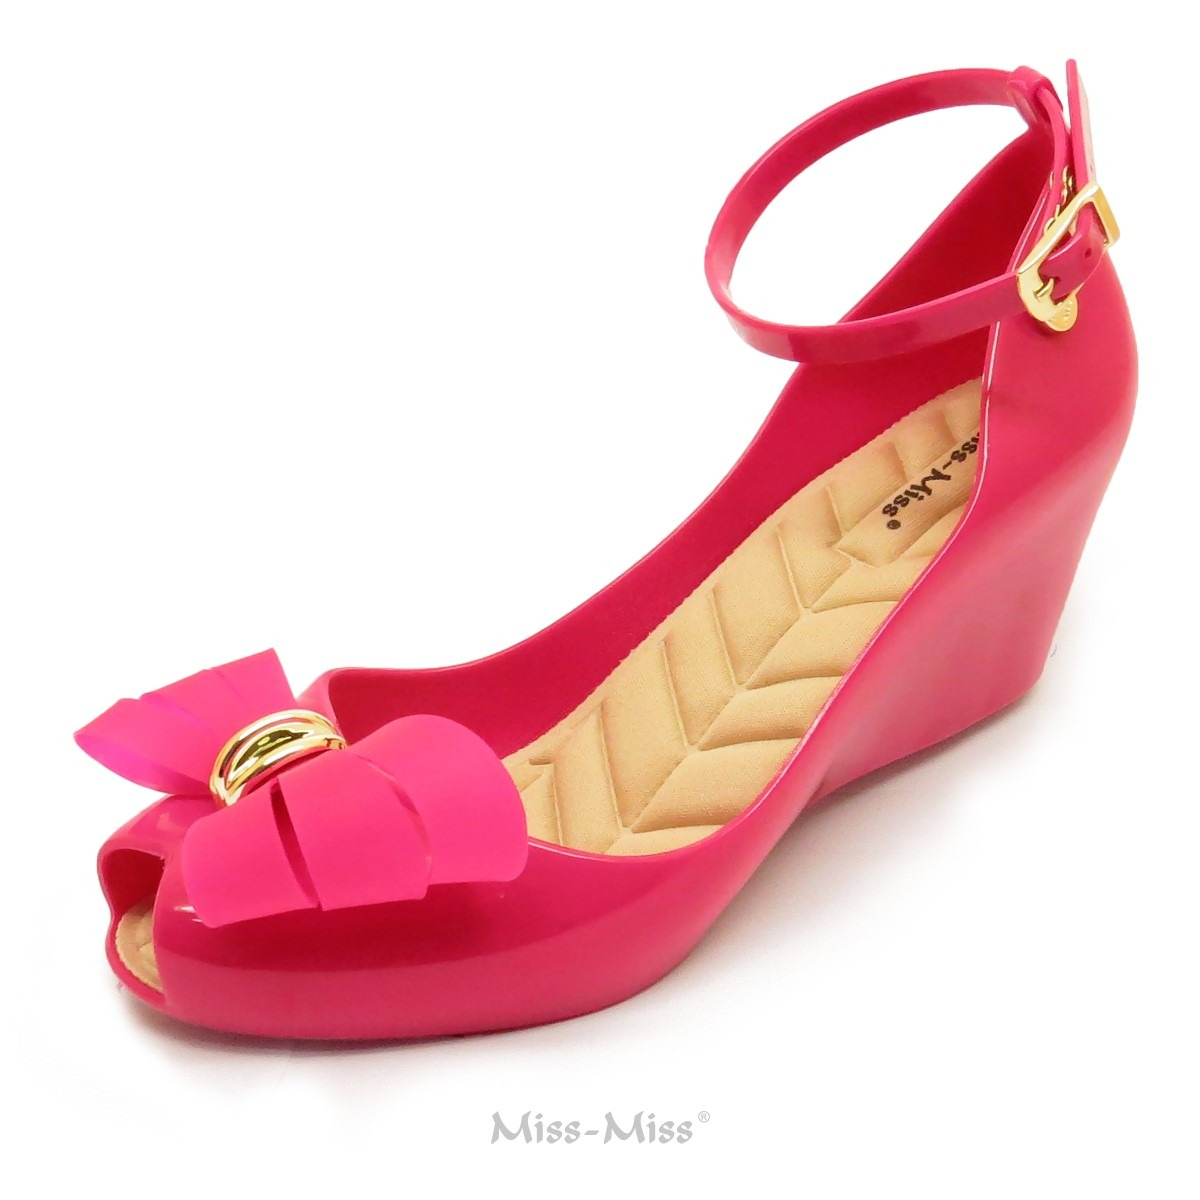 8ec8cfe801 Sandália Anabela Laço 3 Cortes Pink Miss Miss - R  29